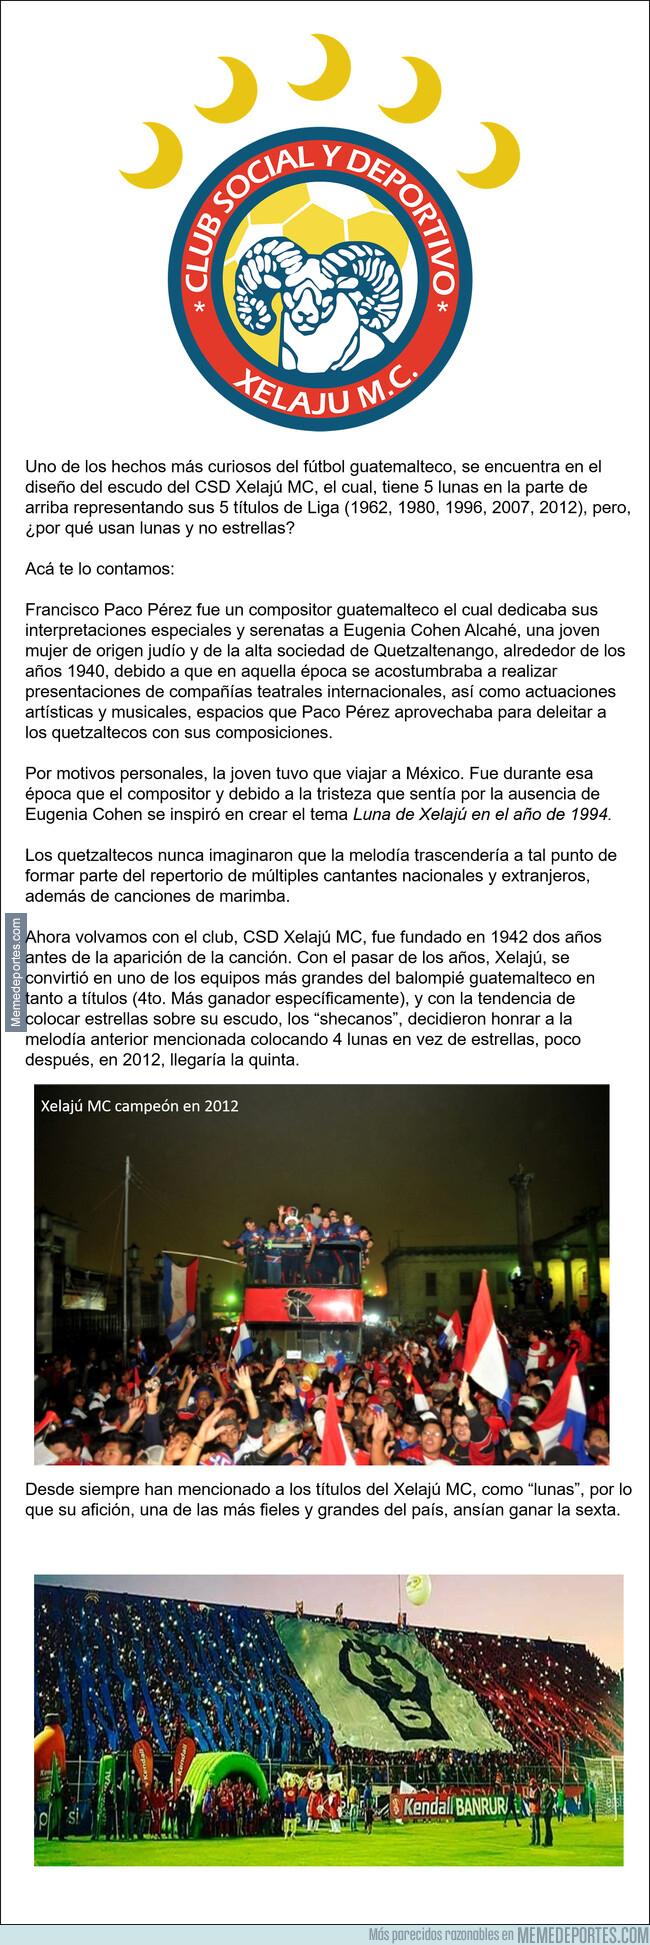 1075216 - Historias del fútbol guatemalteco... Las lunas del Xelajú MC